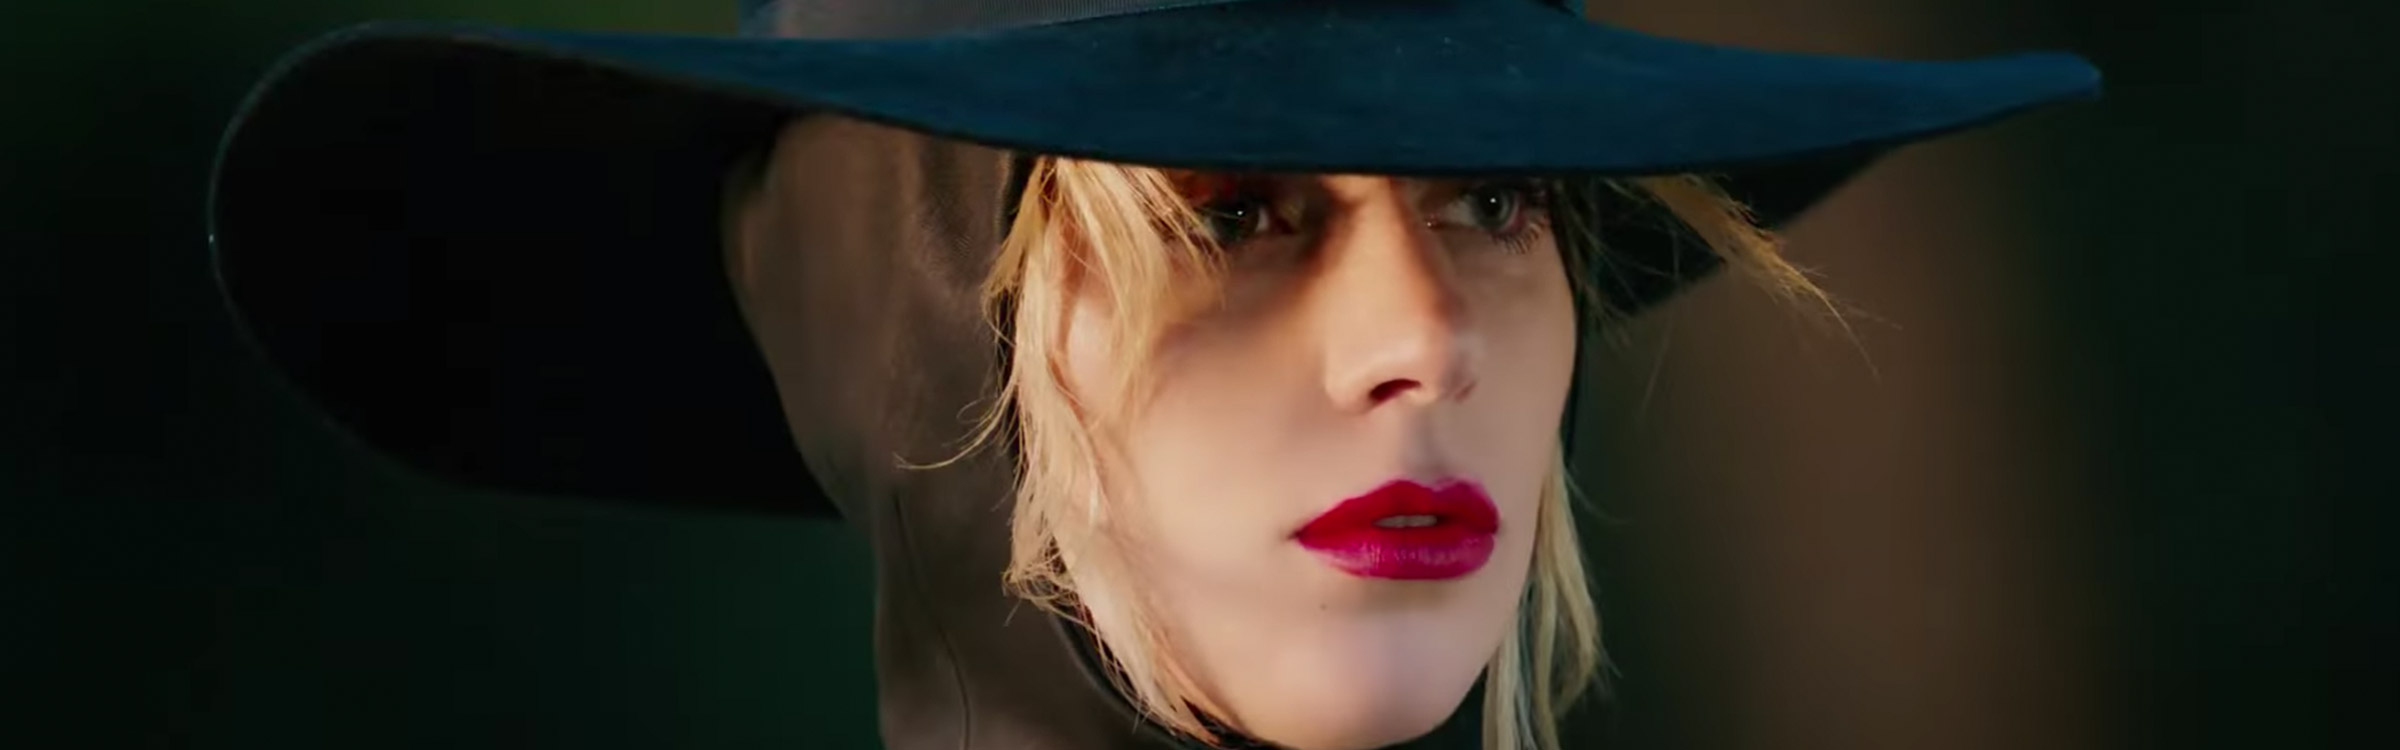 Gaga header